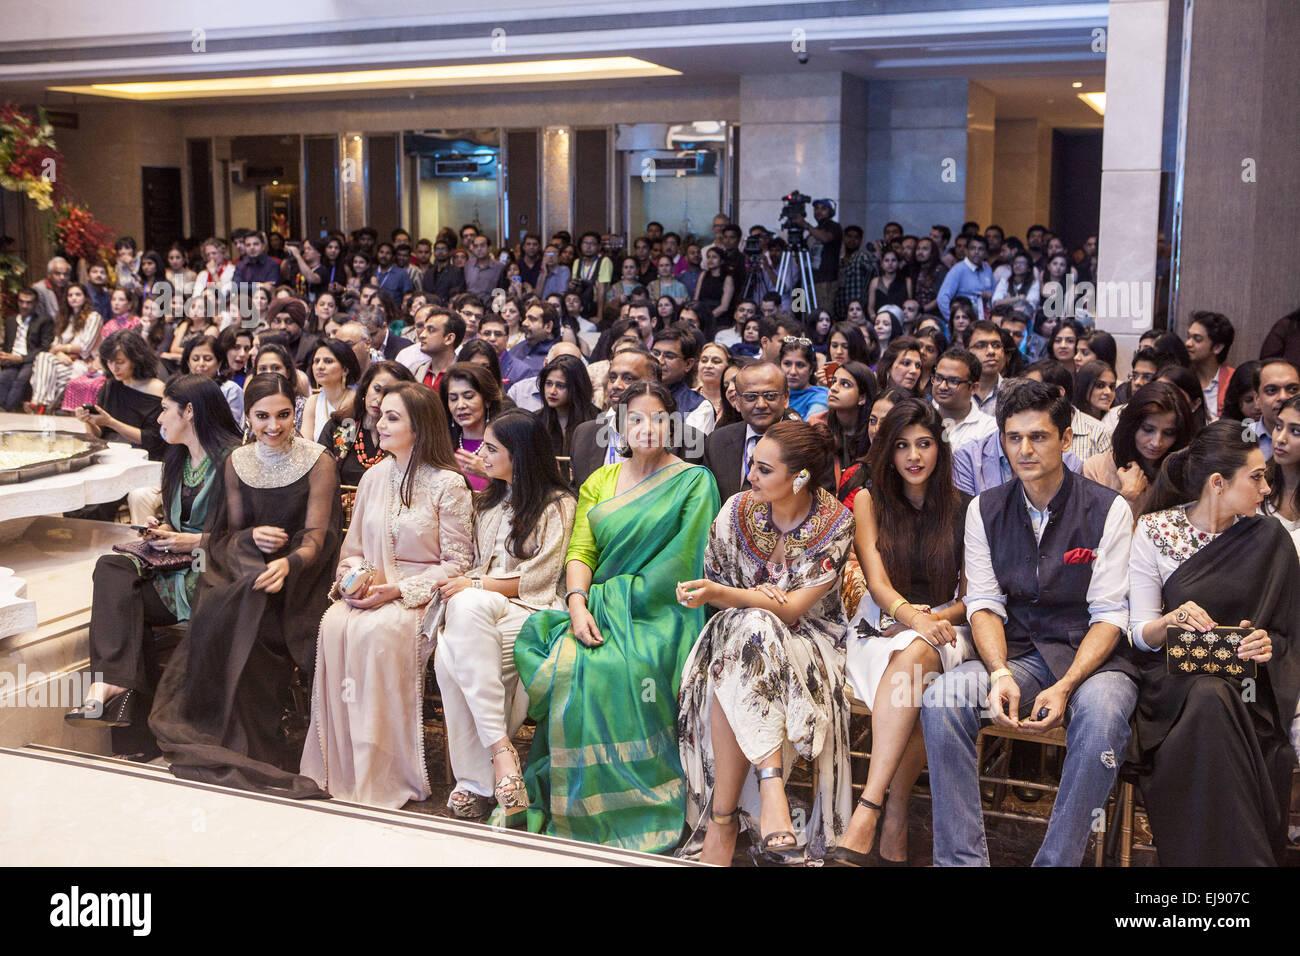 Mumbai, Maharashtra, India. 22nd Mar, 2015. 22 March 2015 : Mumbai - INDIA.Anahita Shroff Adajania (L), Fashion - Stock Image